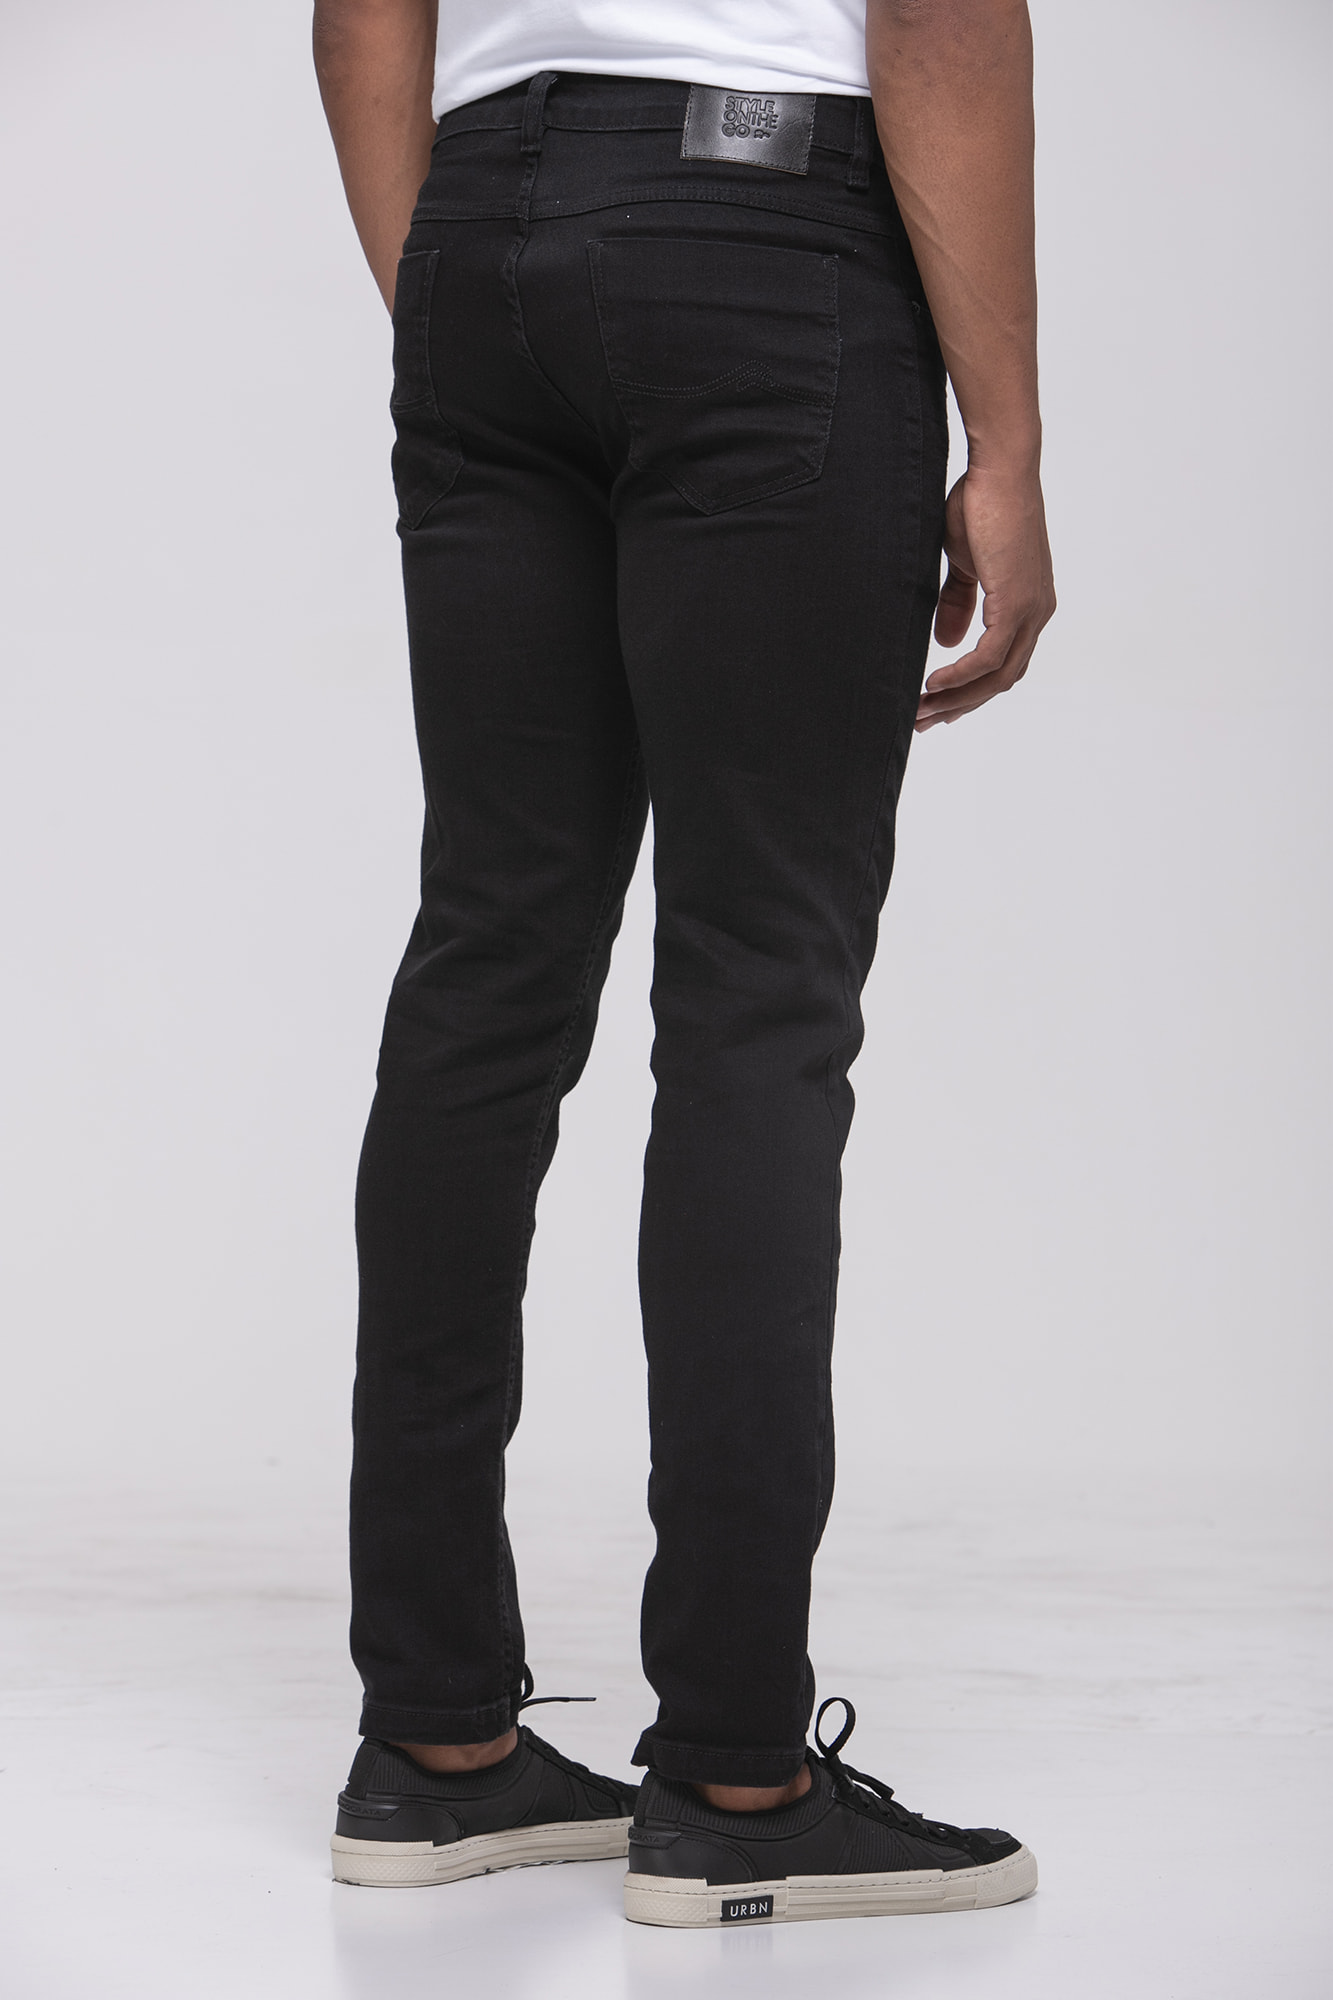 Calça Jeans Black Black